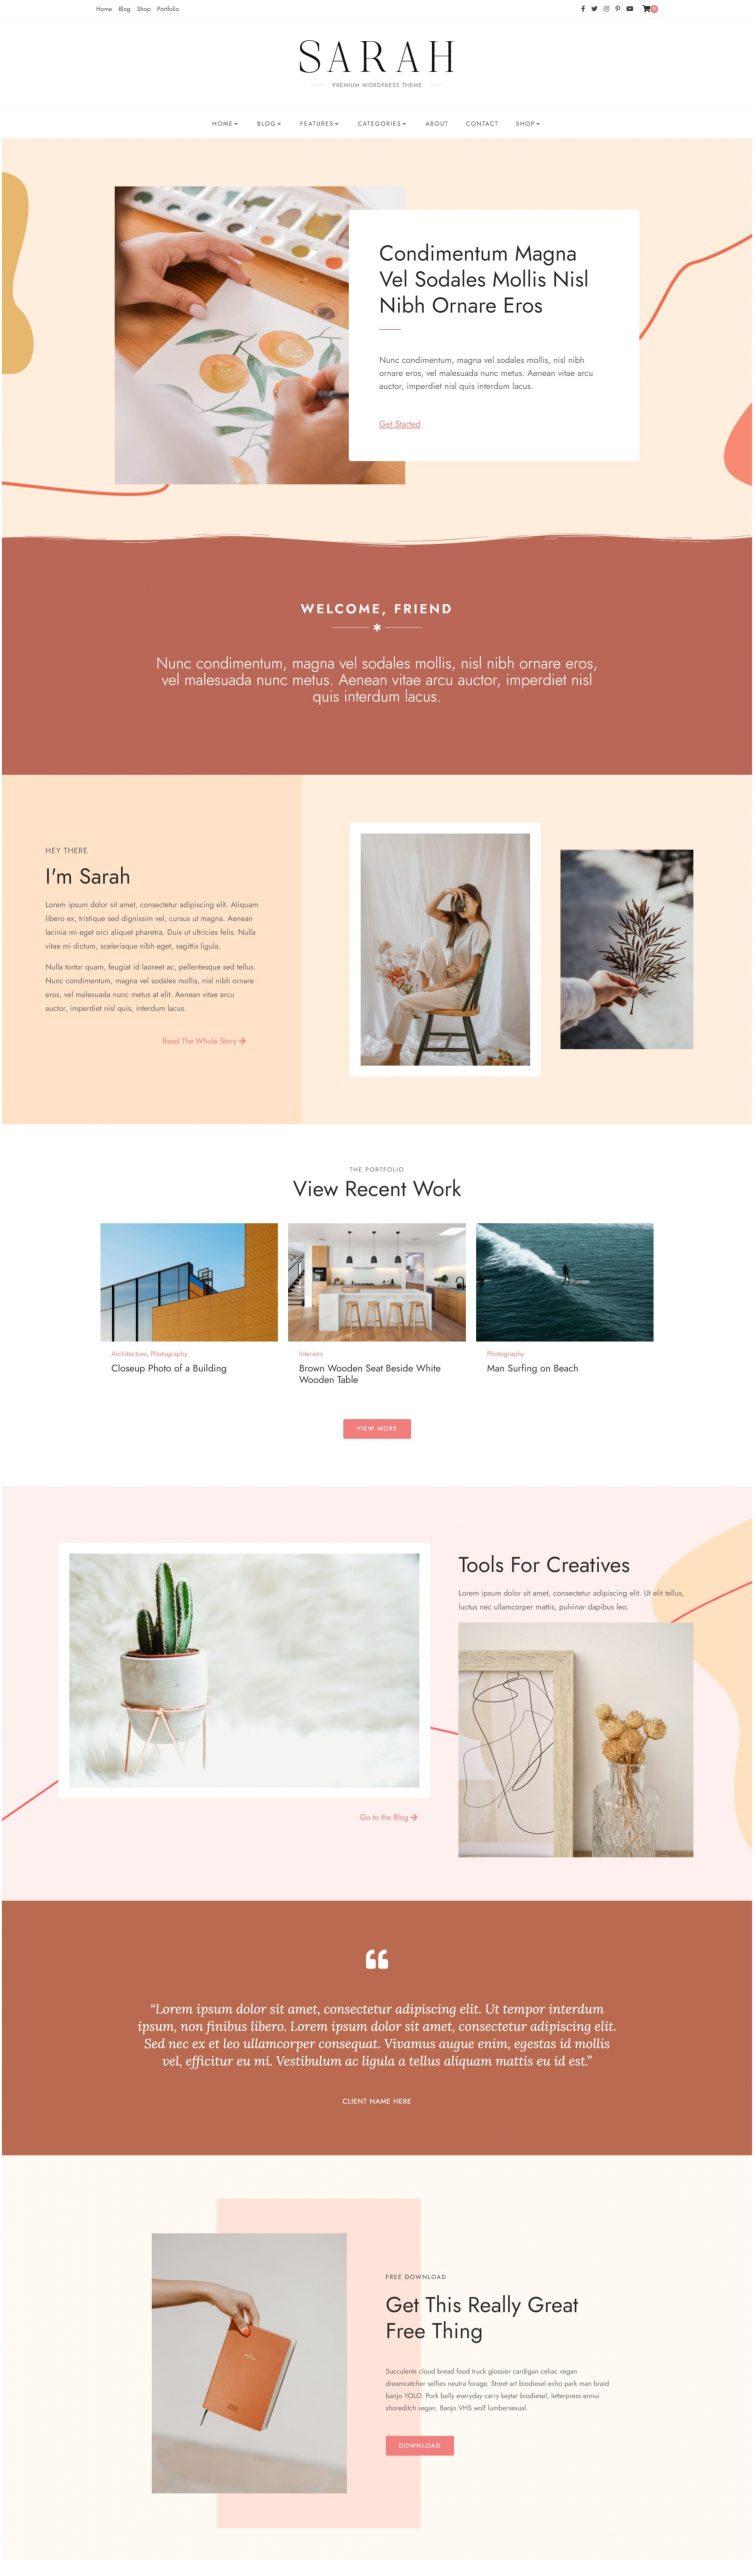 Sarah - Creative and Modern WordPress Theme Peach Color